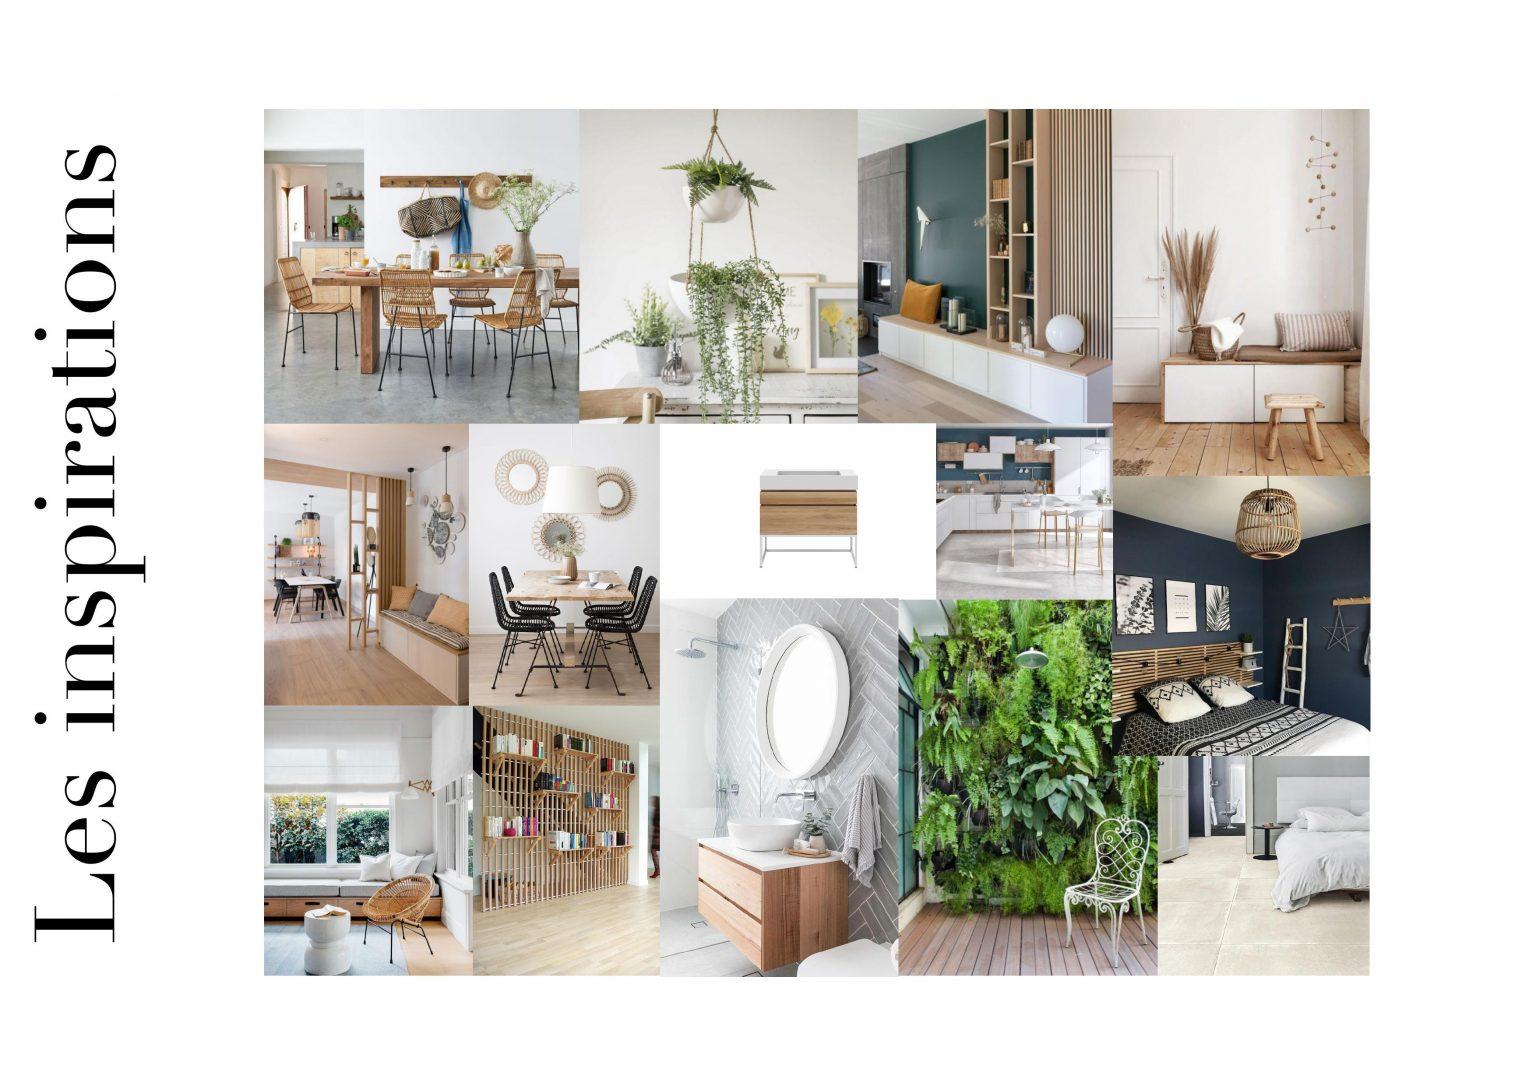 plancheinspirtation-ambiance-cocooning-boheme-amenagement-architecte-interieur-decorateur-montpellier-herault-design-surmesure